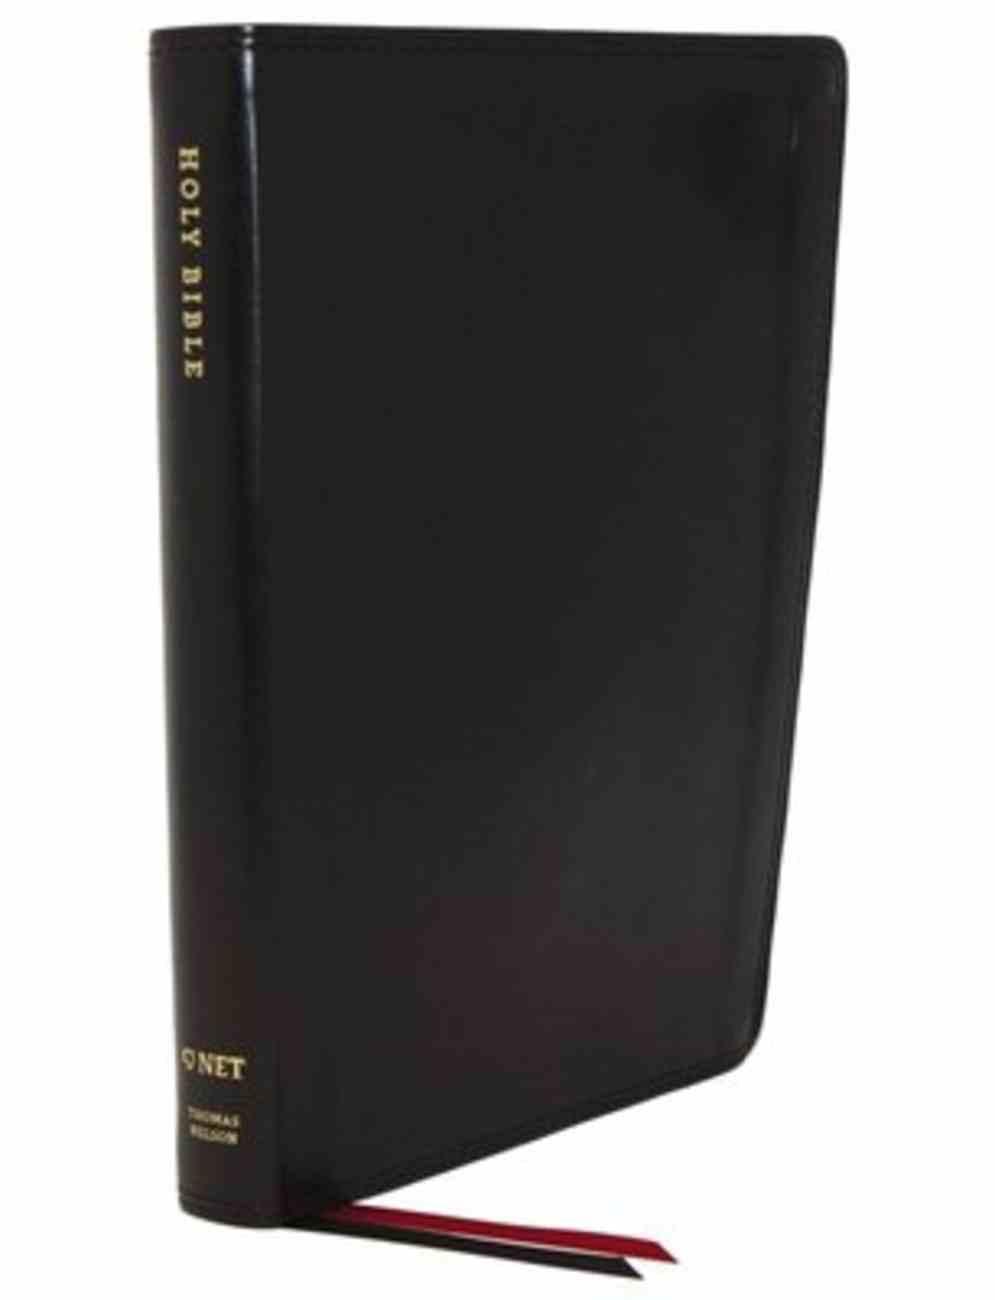 NET Bible Thinline Large Print Black Premium Imitation Leather